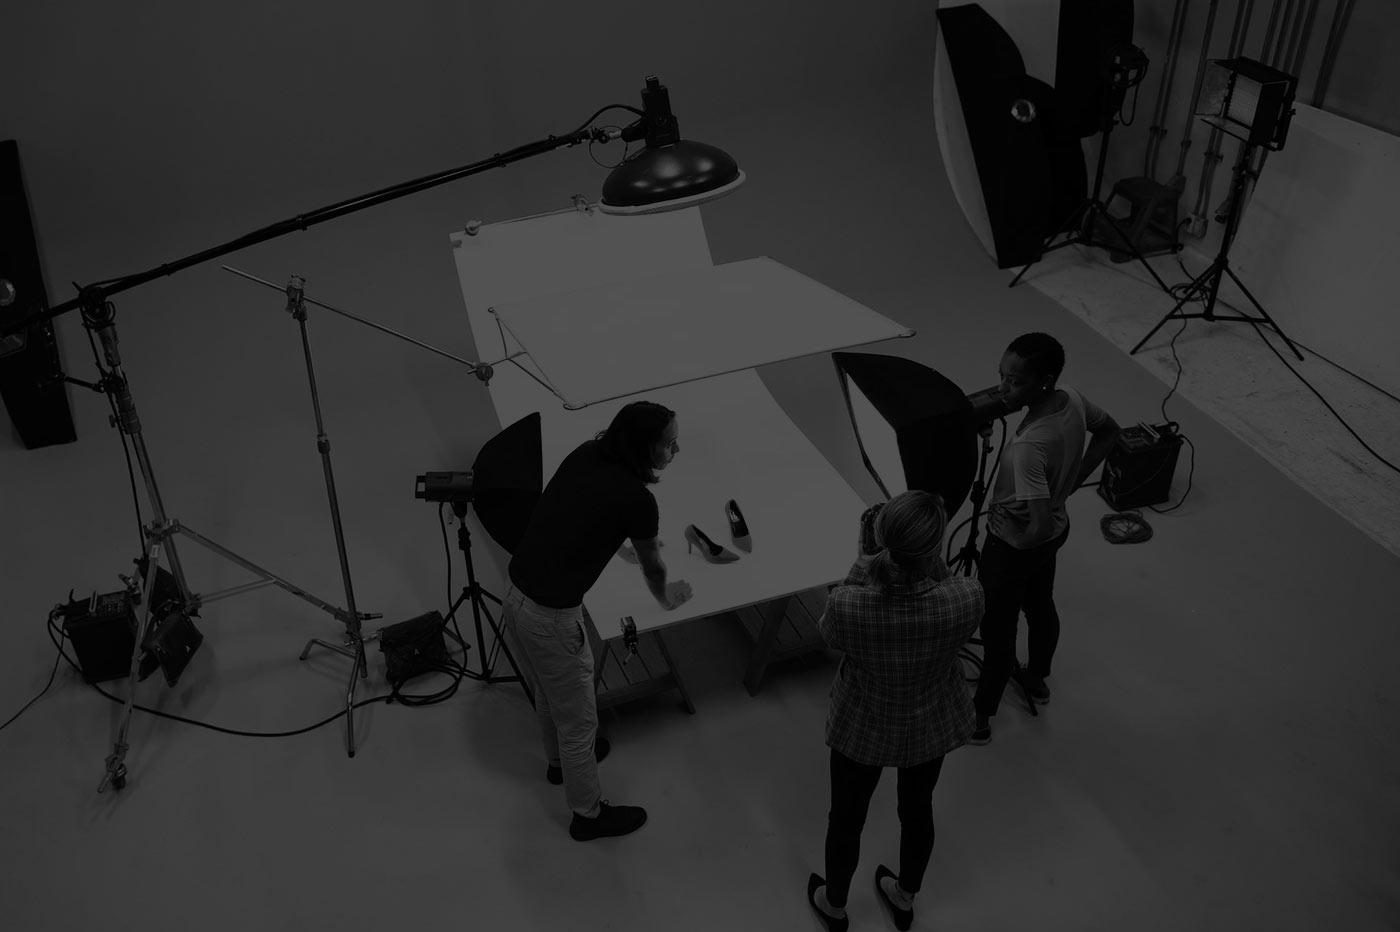 Merchandise Photo Shoot Services